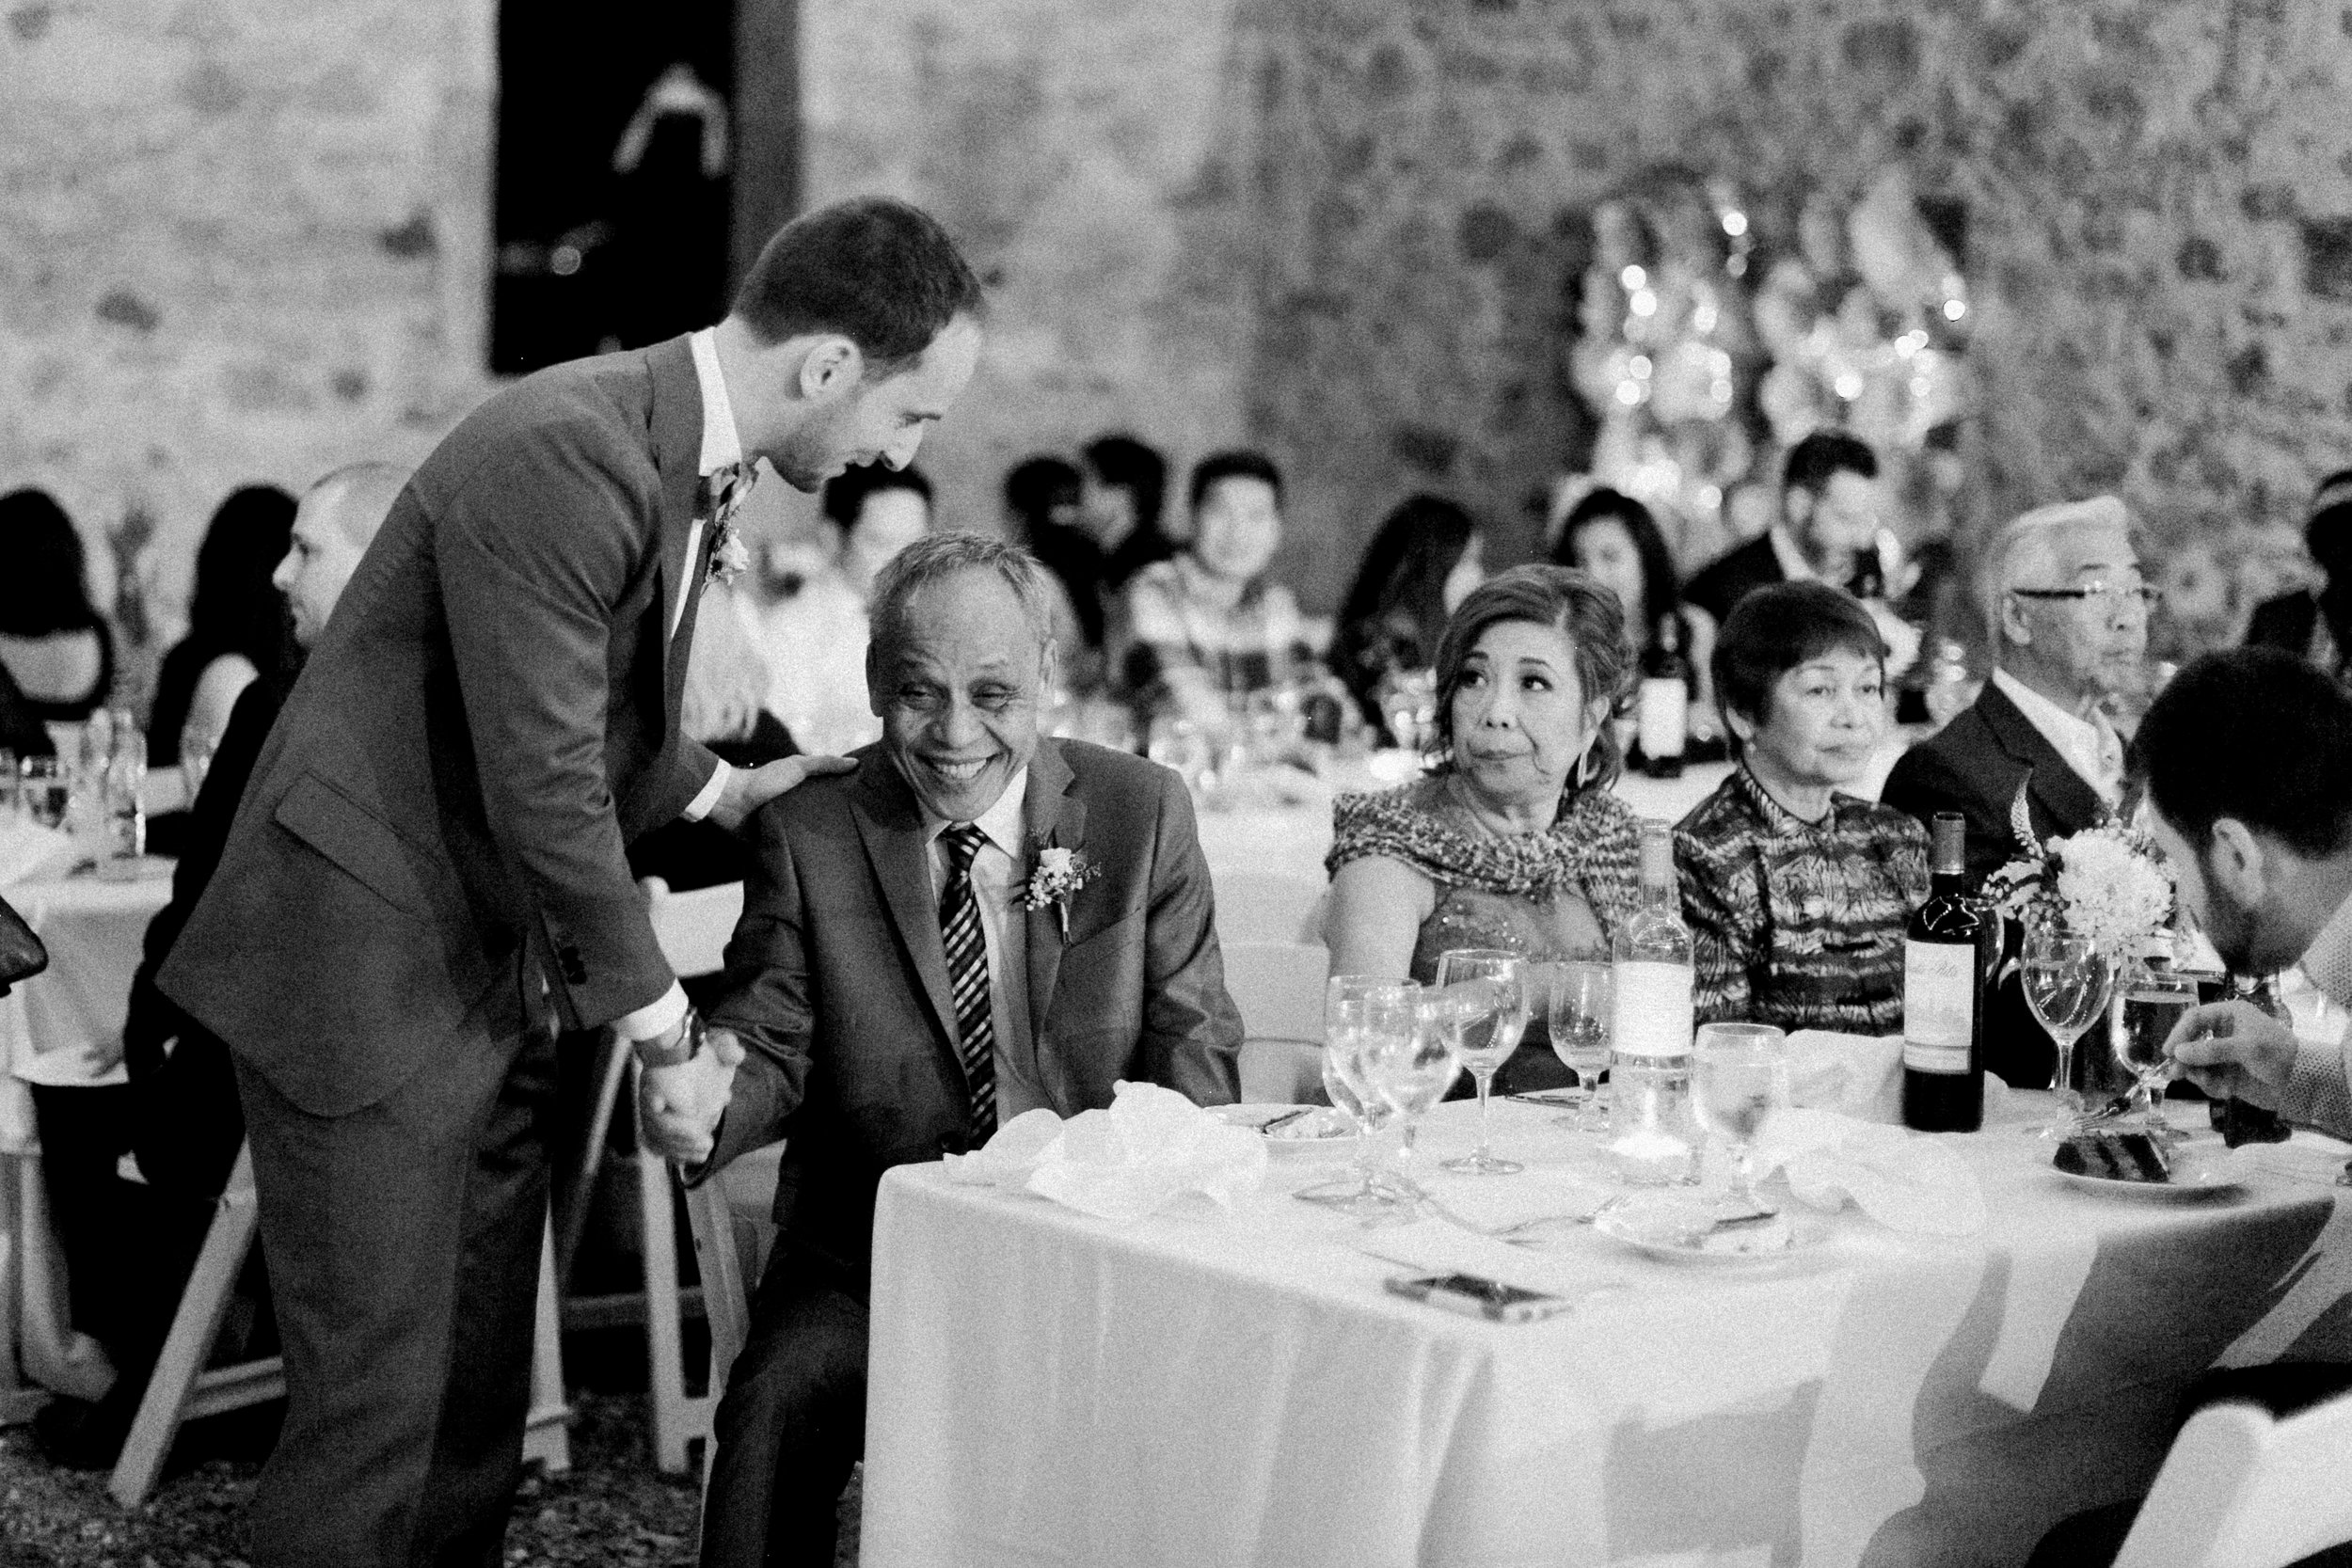 Alton Mills Wedding - Reception-151.jpg